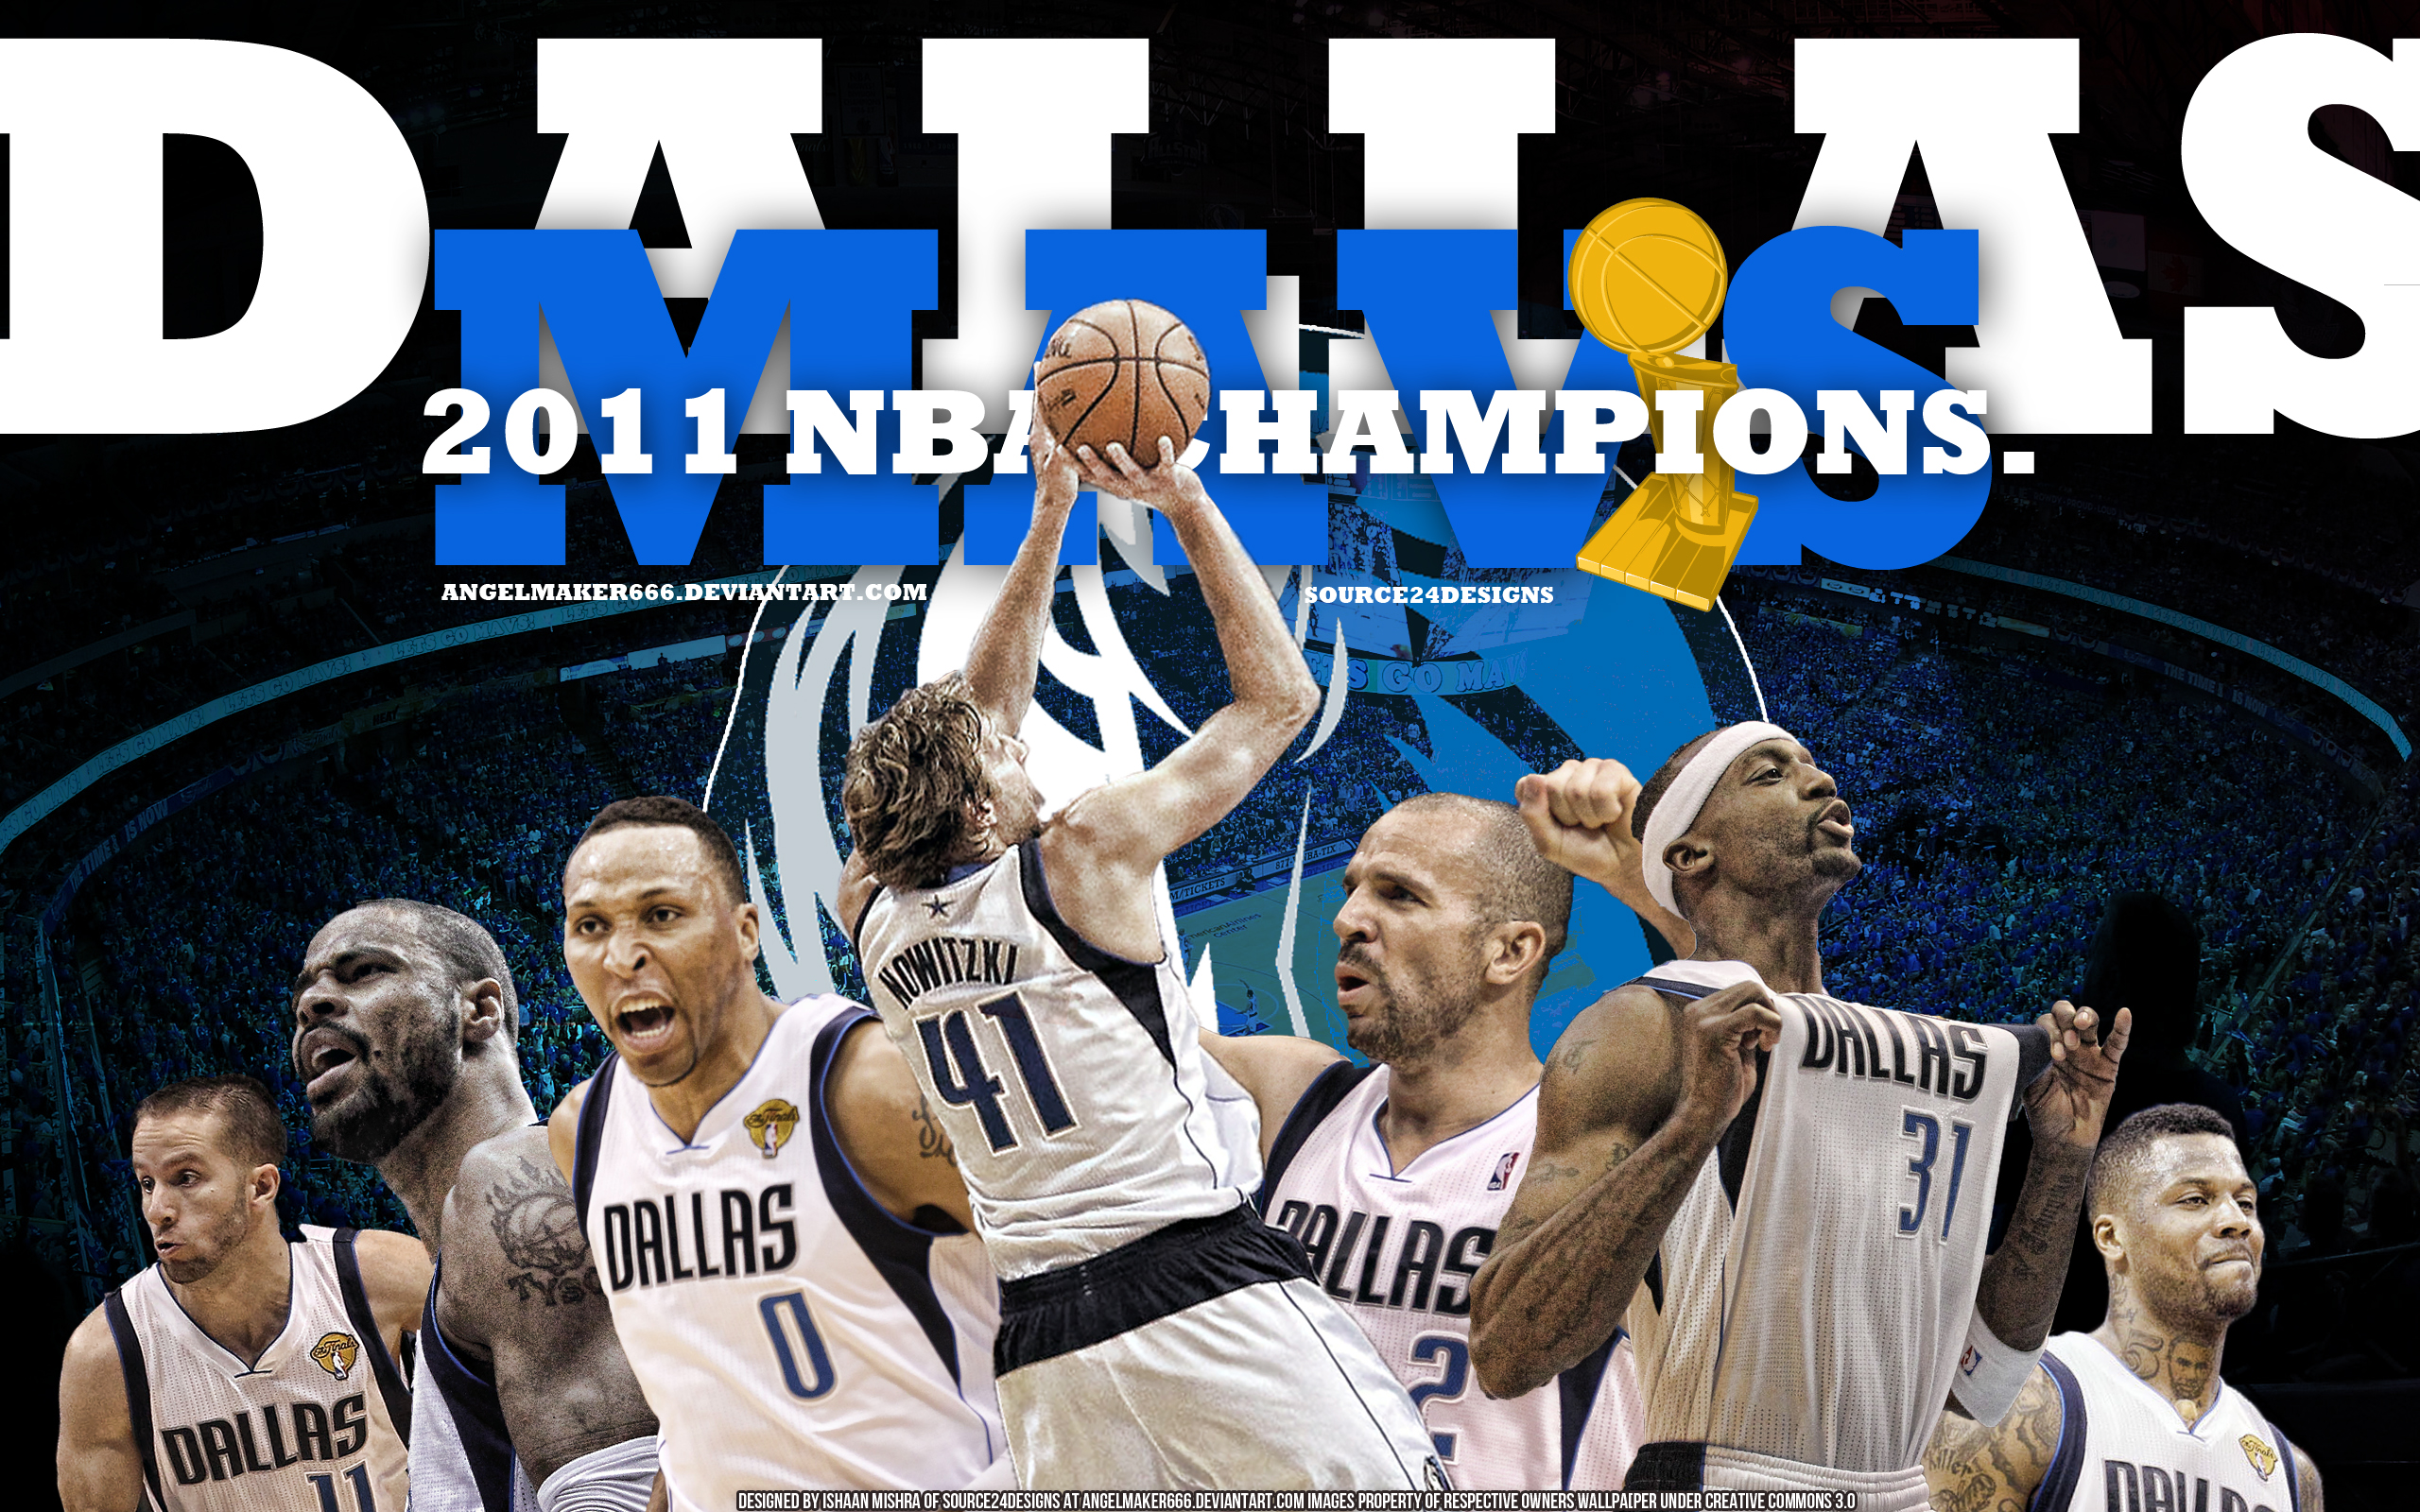 Mavs 2011 NBA Champions Wall by Angelmaker666